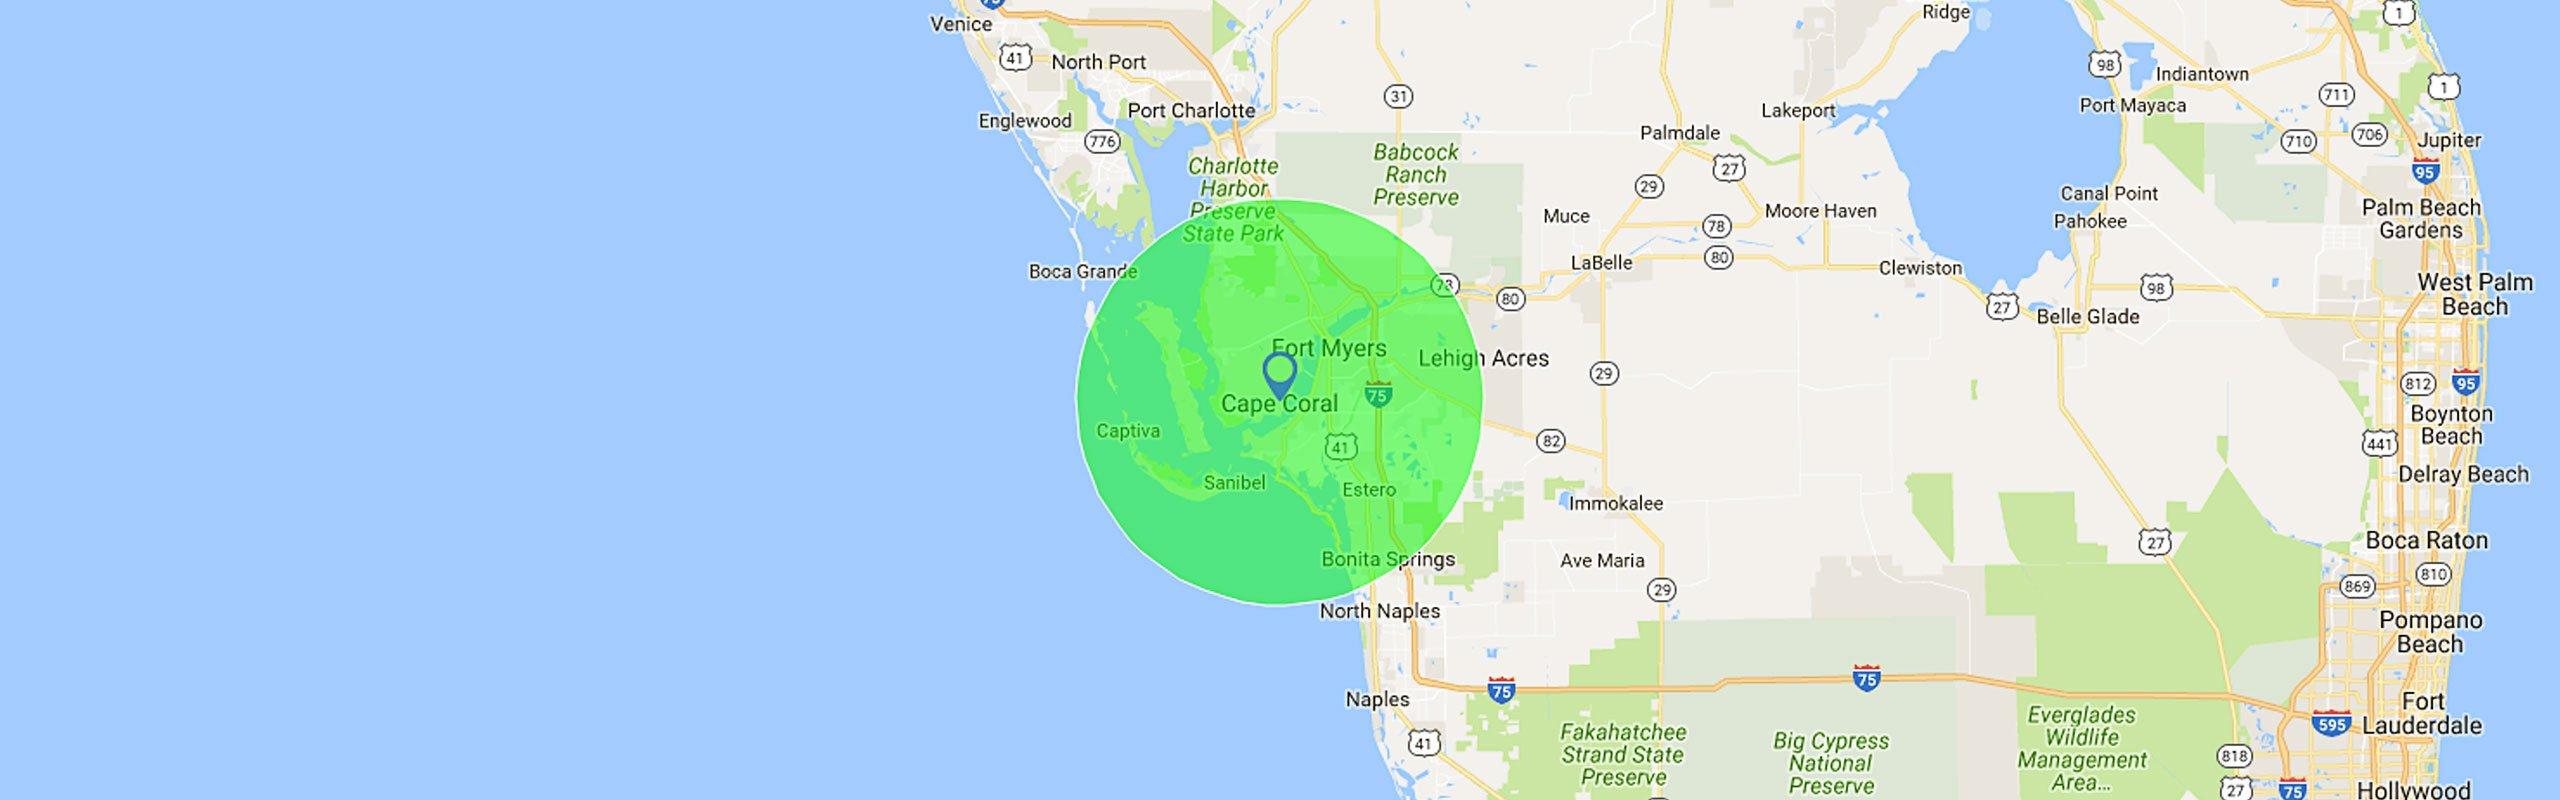 Ameritech Pest Control Services, Inc. 239-541-4100